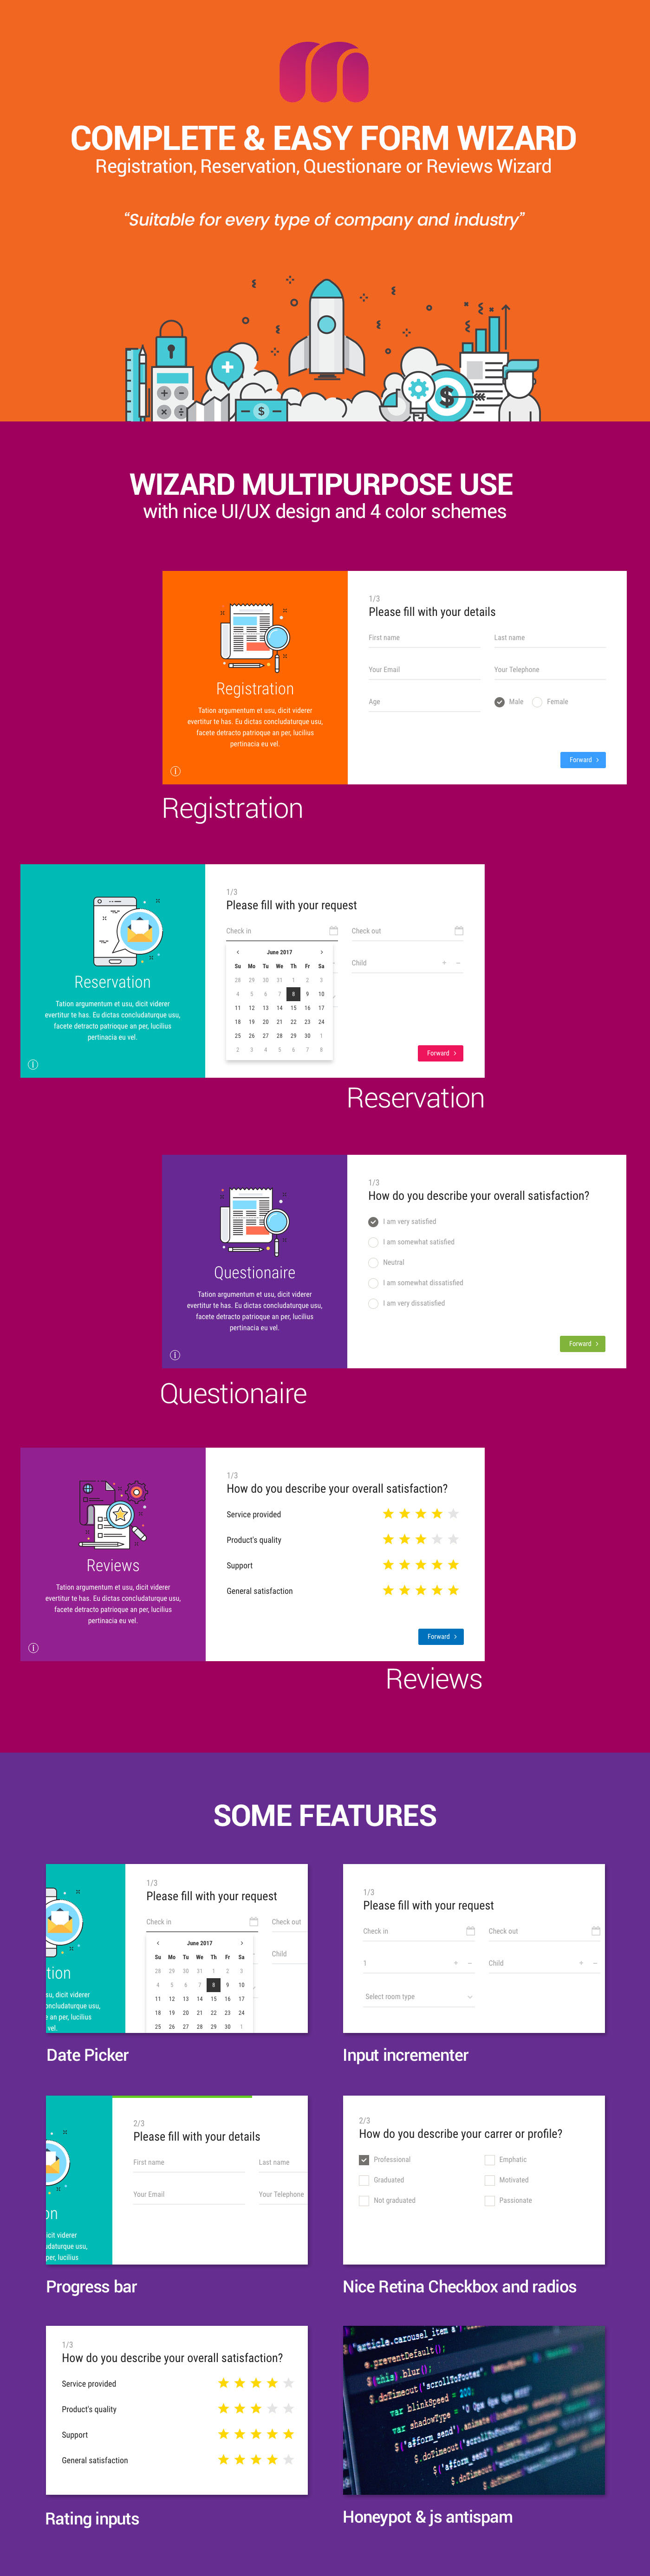 form email wizard questionare register registration reservation reviews signup survey Web